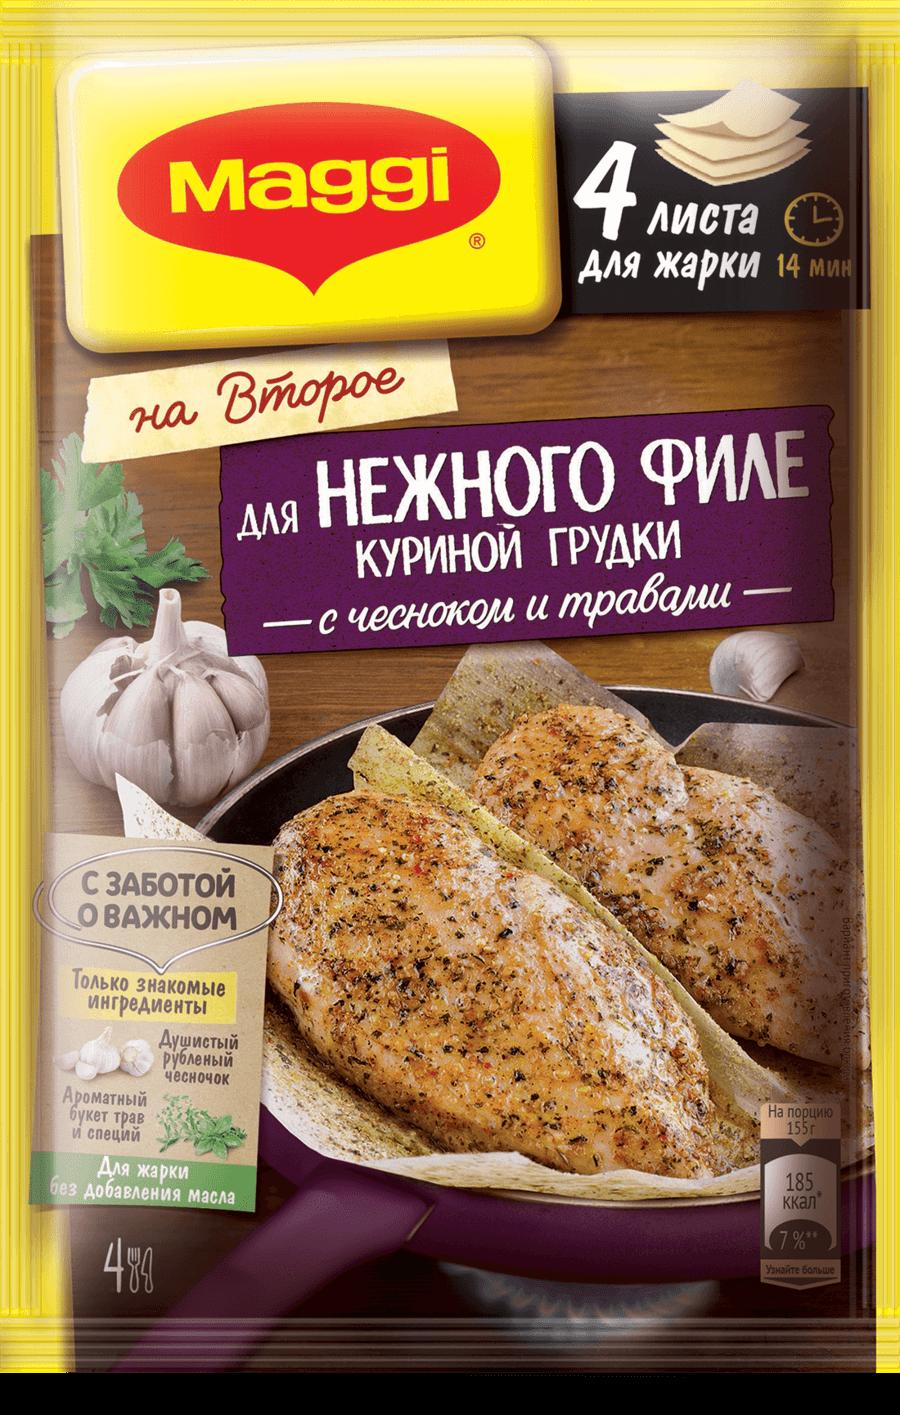 Гречка по -купечески Магги - пошаговый рецепт с фото на Повар. ру 100